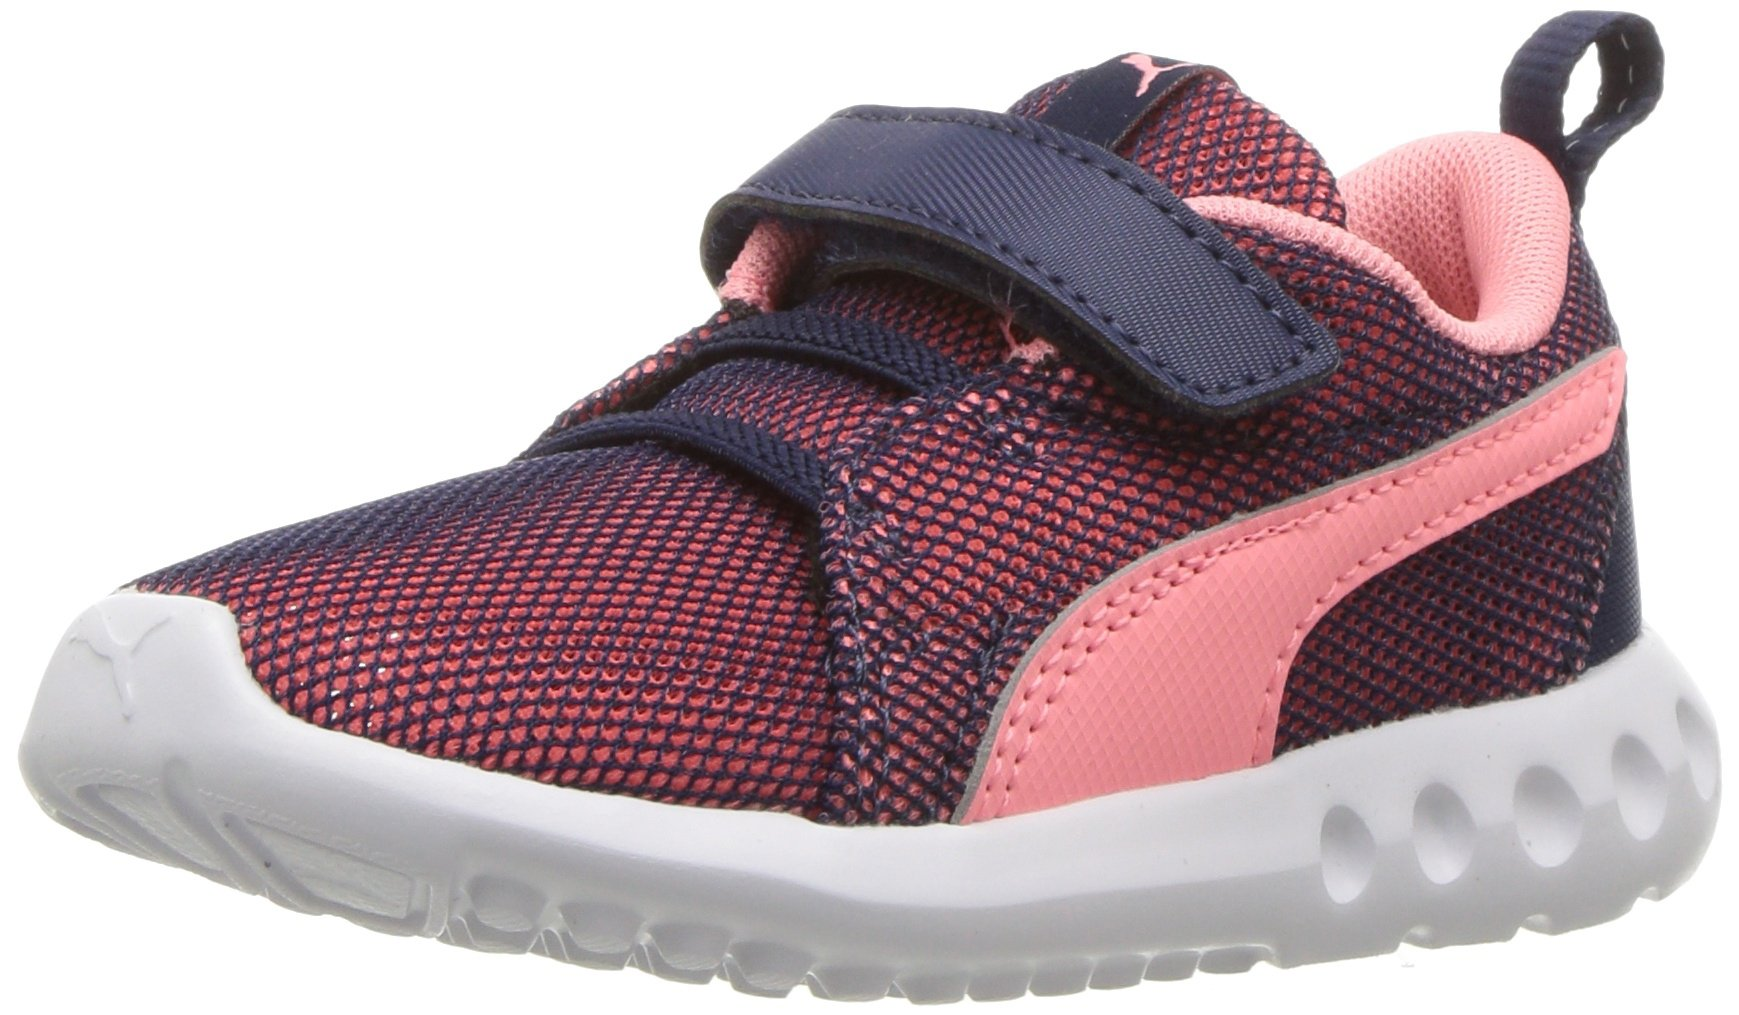 PUMA Baby Carson 2 Breathe Velcro Kids Sneaker, Peacoat-Soft Fluo Peach, 6 M US Toddler